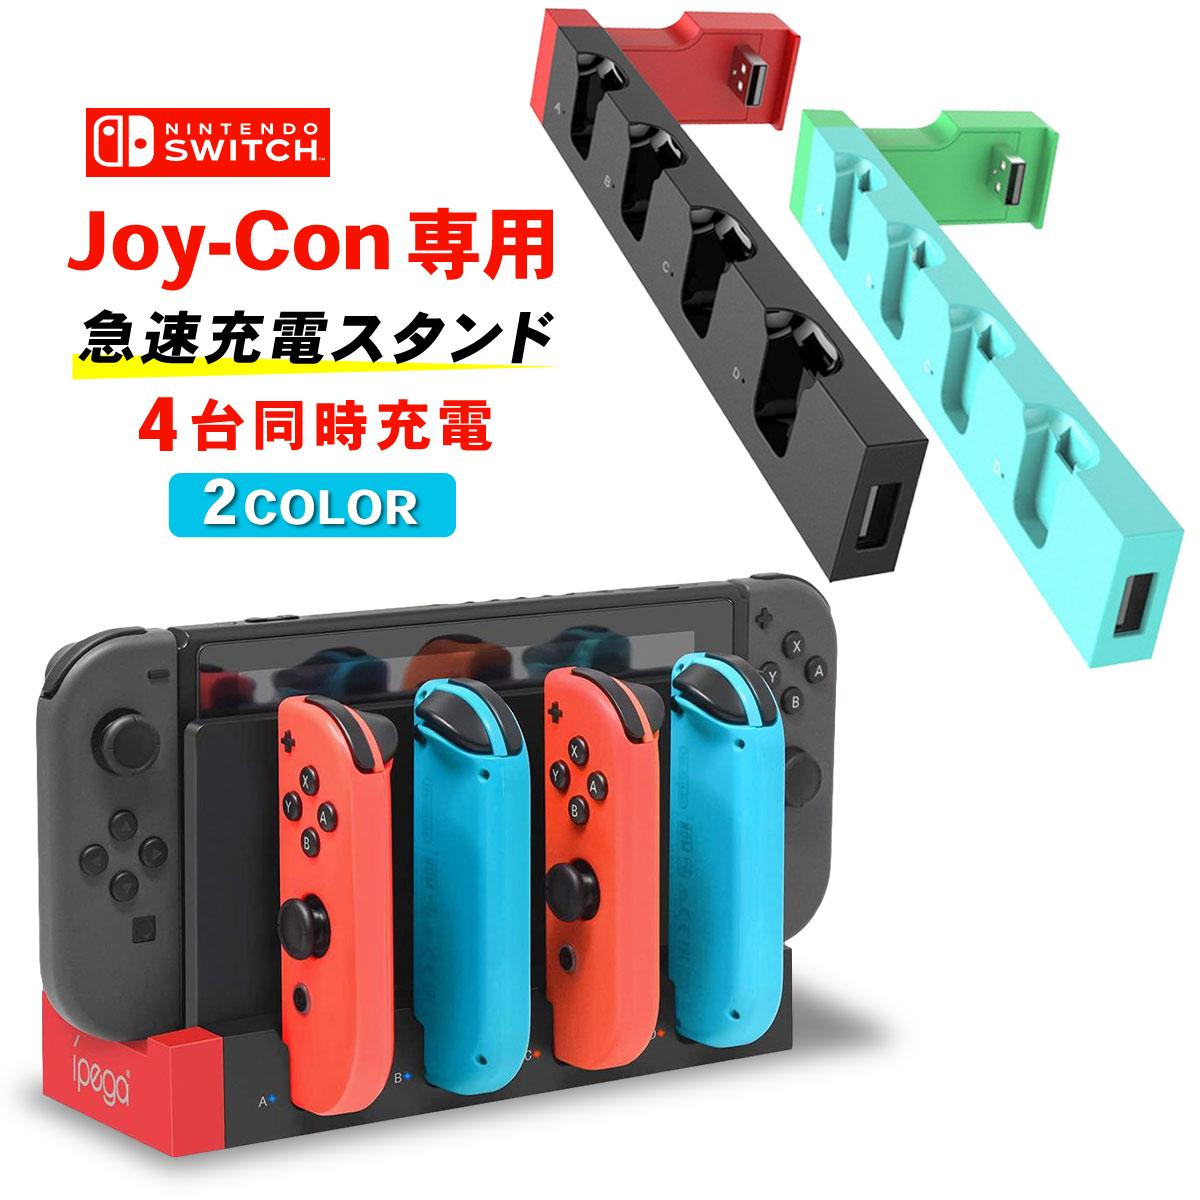 Nintendo Switch 急速充電器 4台同時充電 充電スタンド ジョイコン コントローラー 信頼 35%OFF ハンドル ホルダー 充電ドック ニンテンドースイッチ 充電